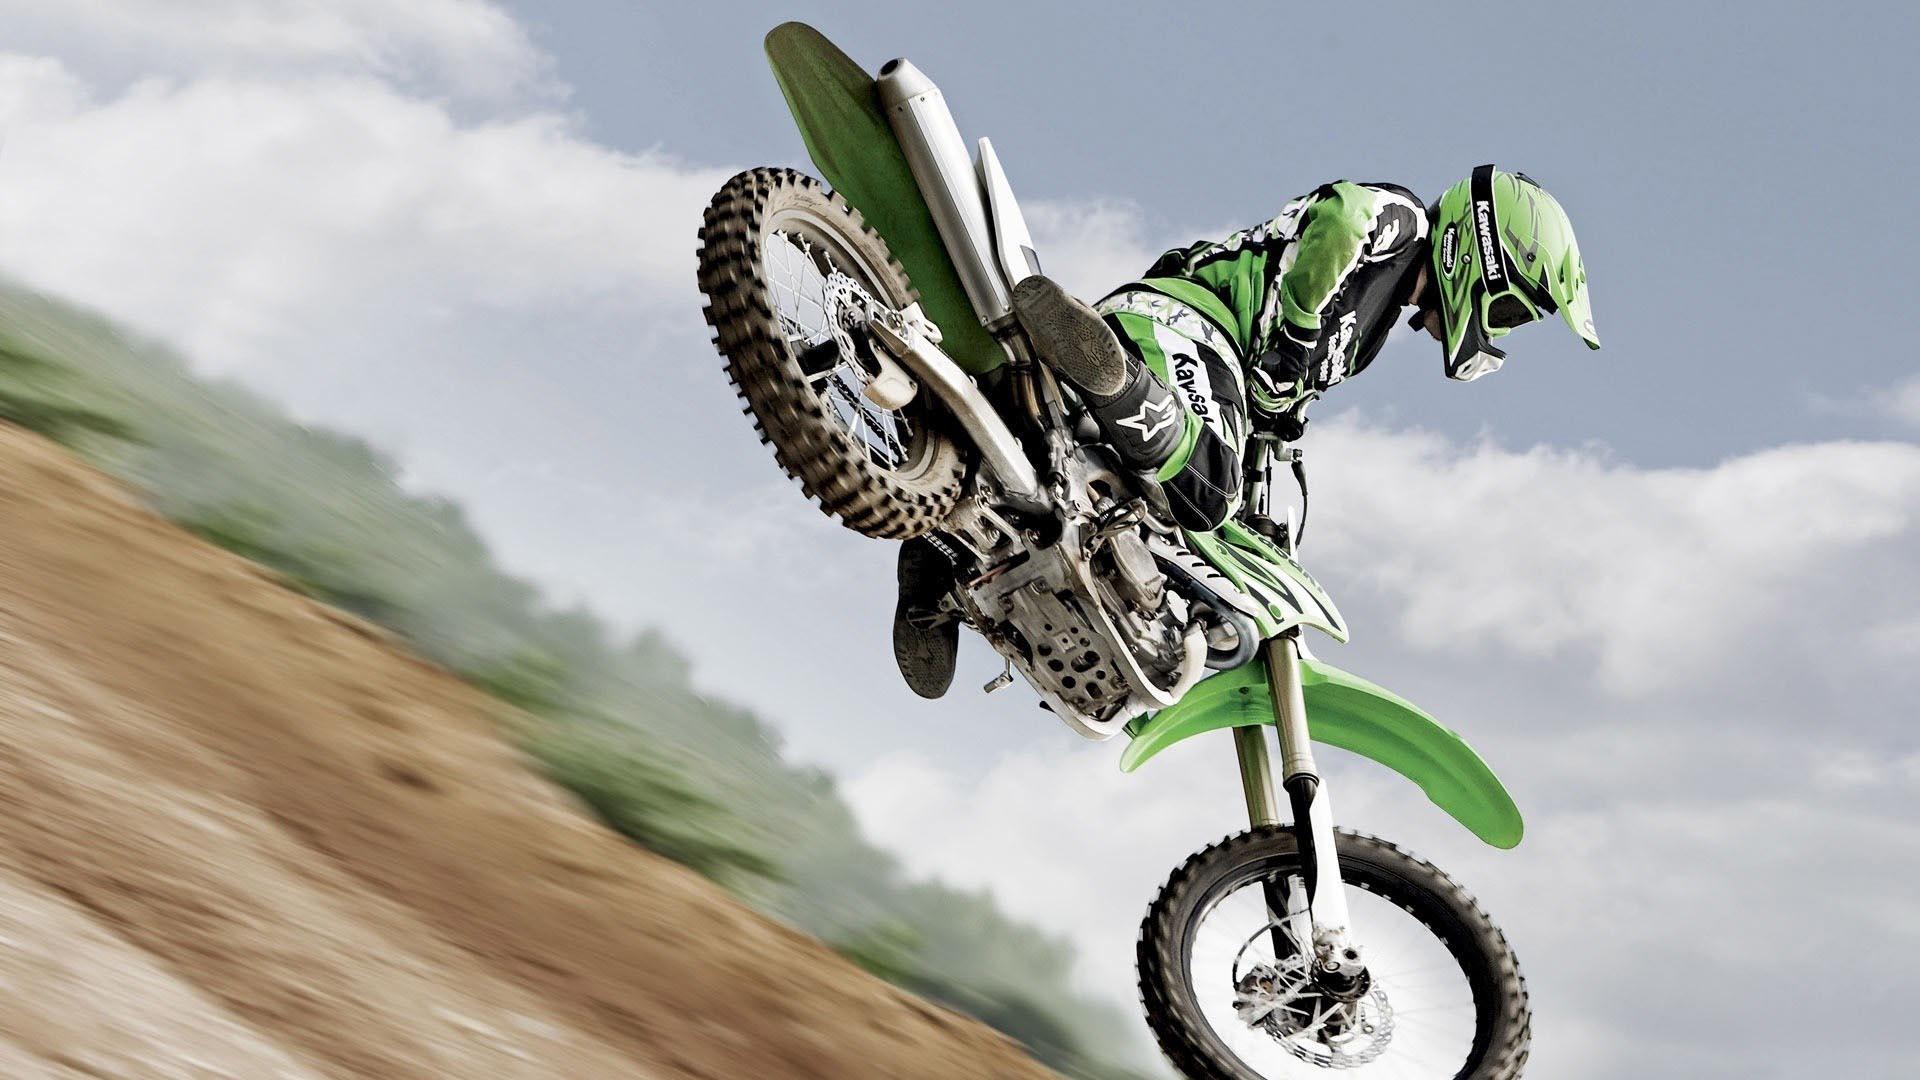 Motocross Green Kawasaki HD Wallpaper FullHDWpp   Full HD 1920x1080